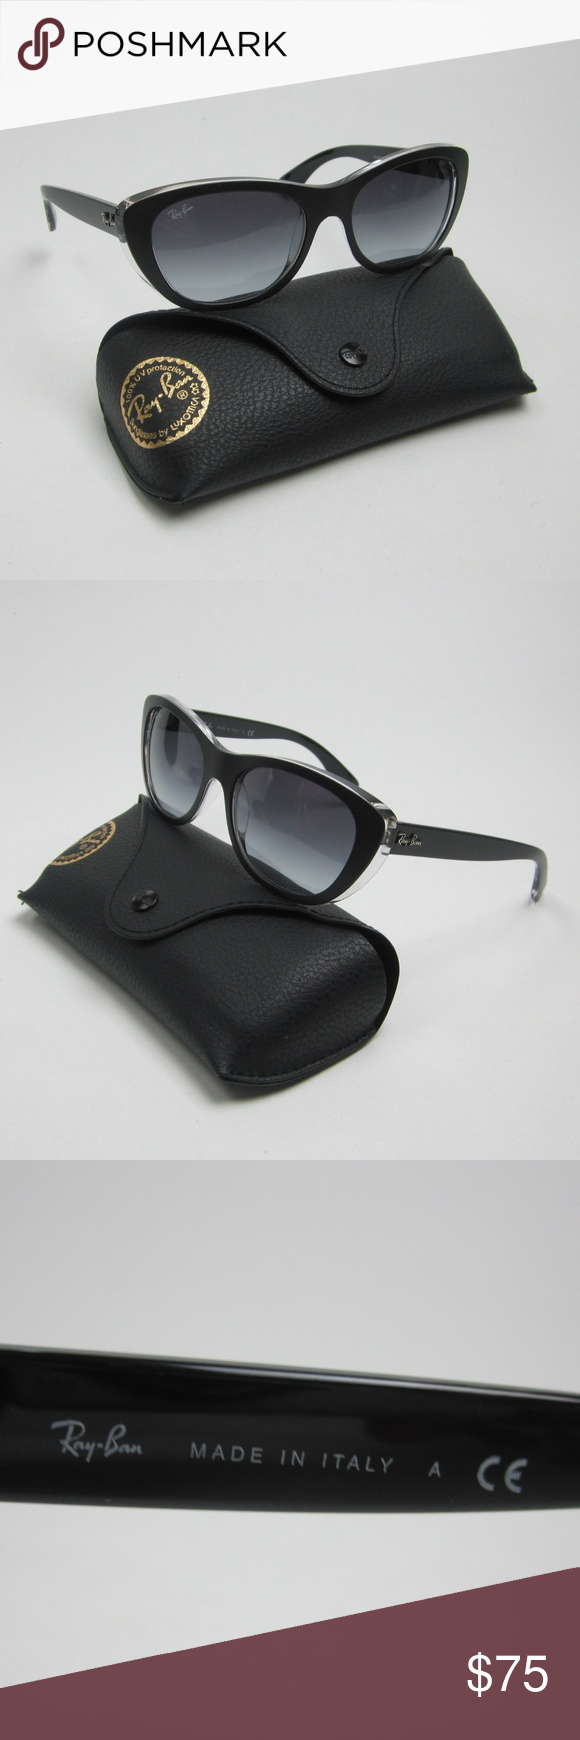 bb9e9a2b065 RayBan RB4227 Sunglasses Italy STL637